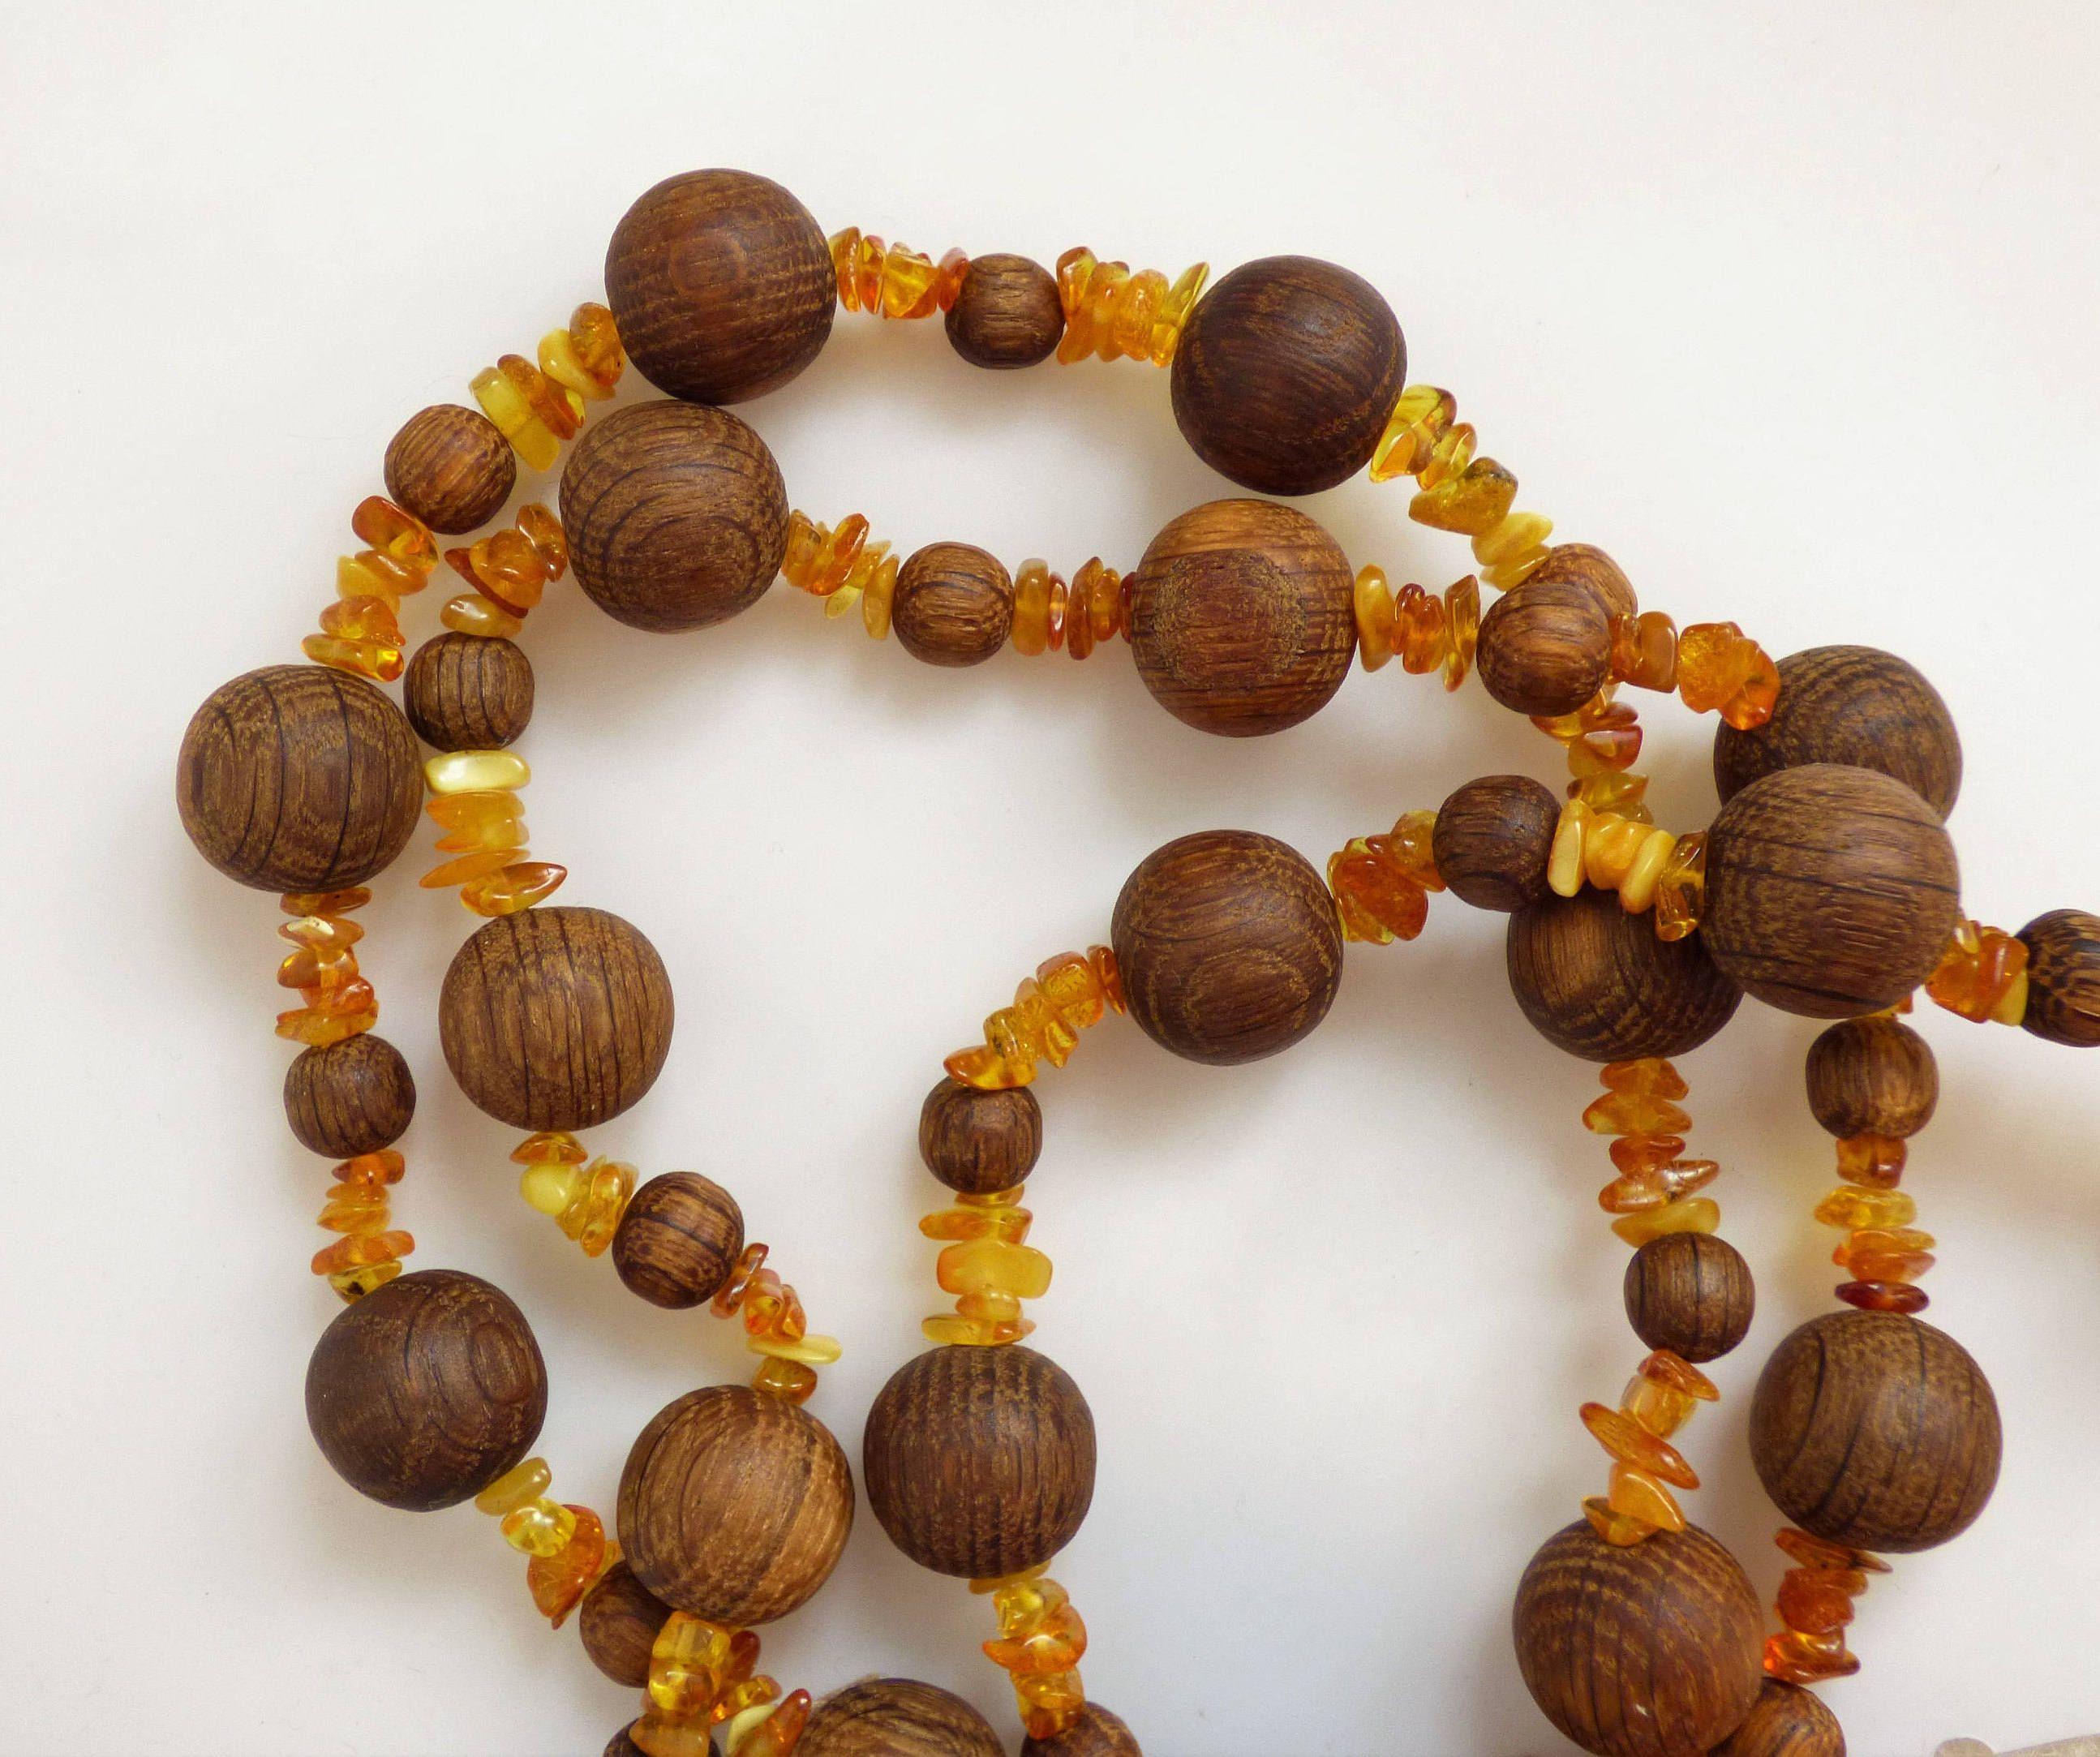 Unisex Handmade Folk Art Vintage French Wood Oak Beads & Baltic Amber Necklace Size 54 in / 137 cm #baltic